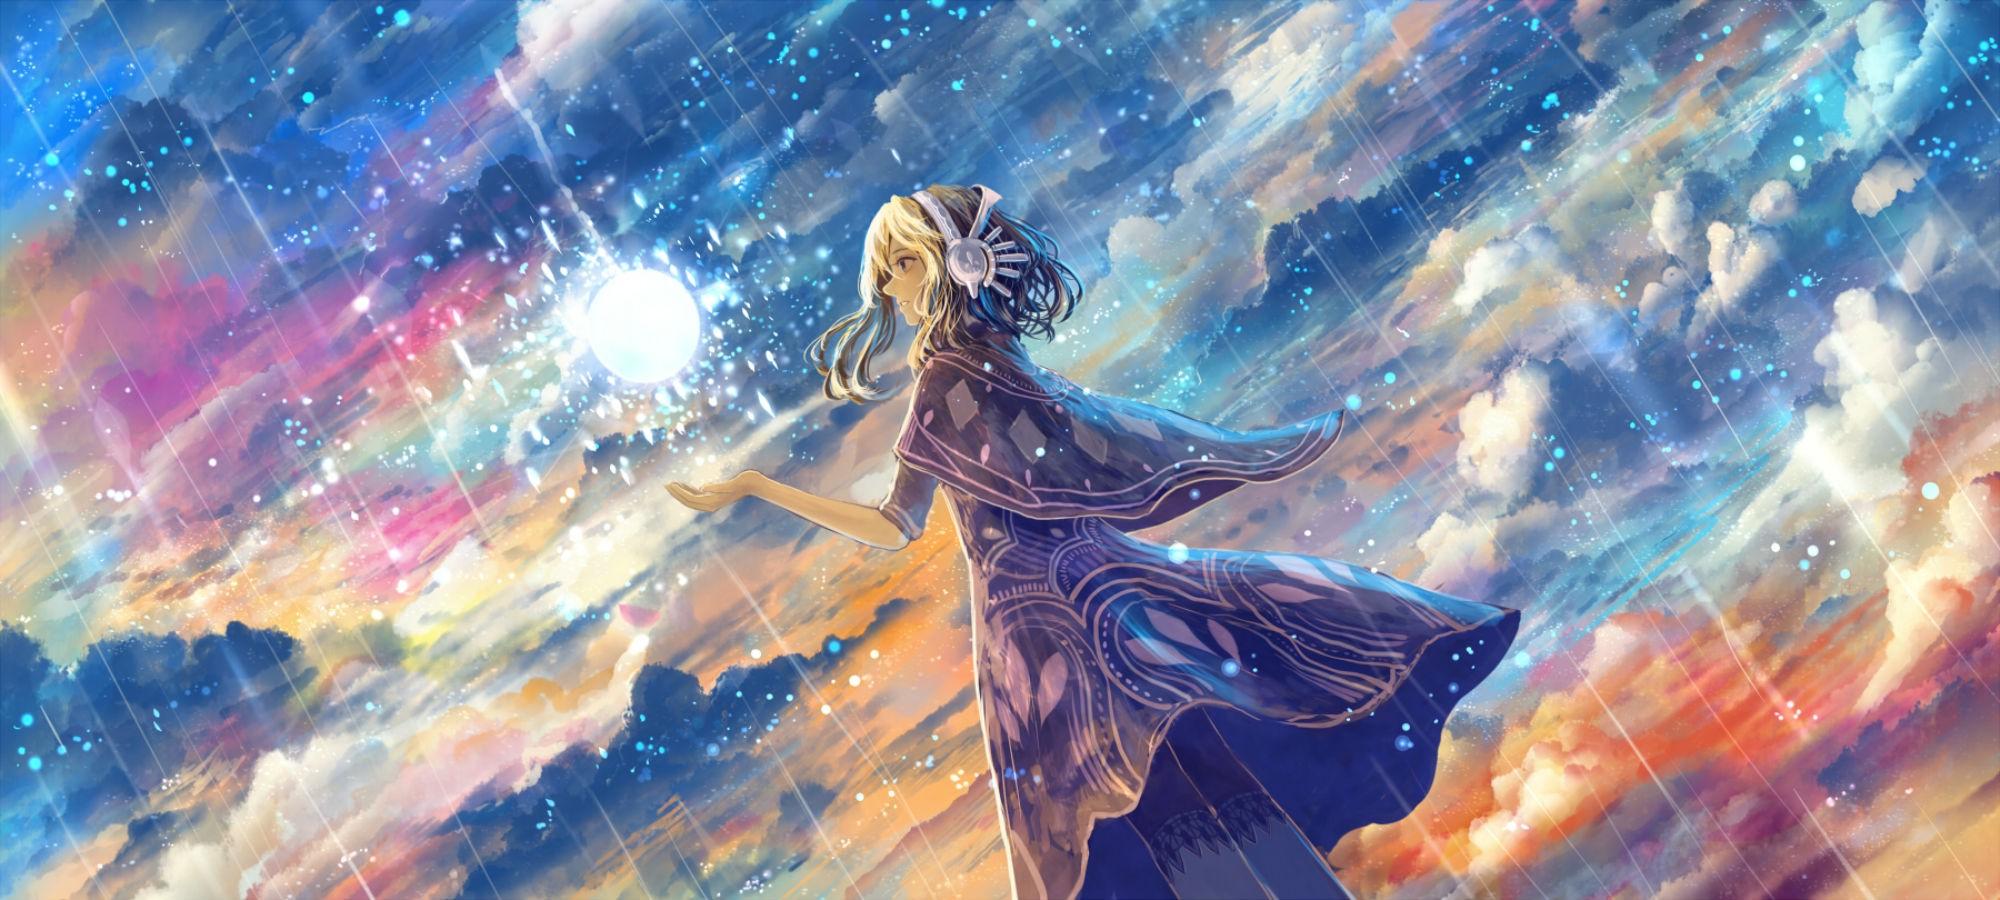 Wallpaper 2000x900 Px Anime Artwork Clouds Fantasy Art Magic